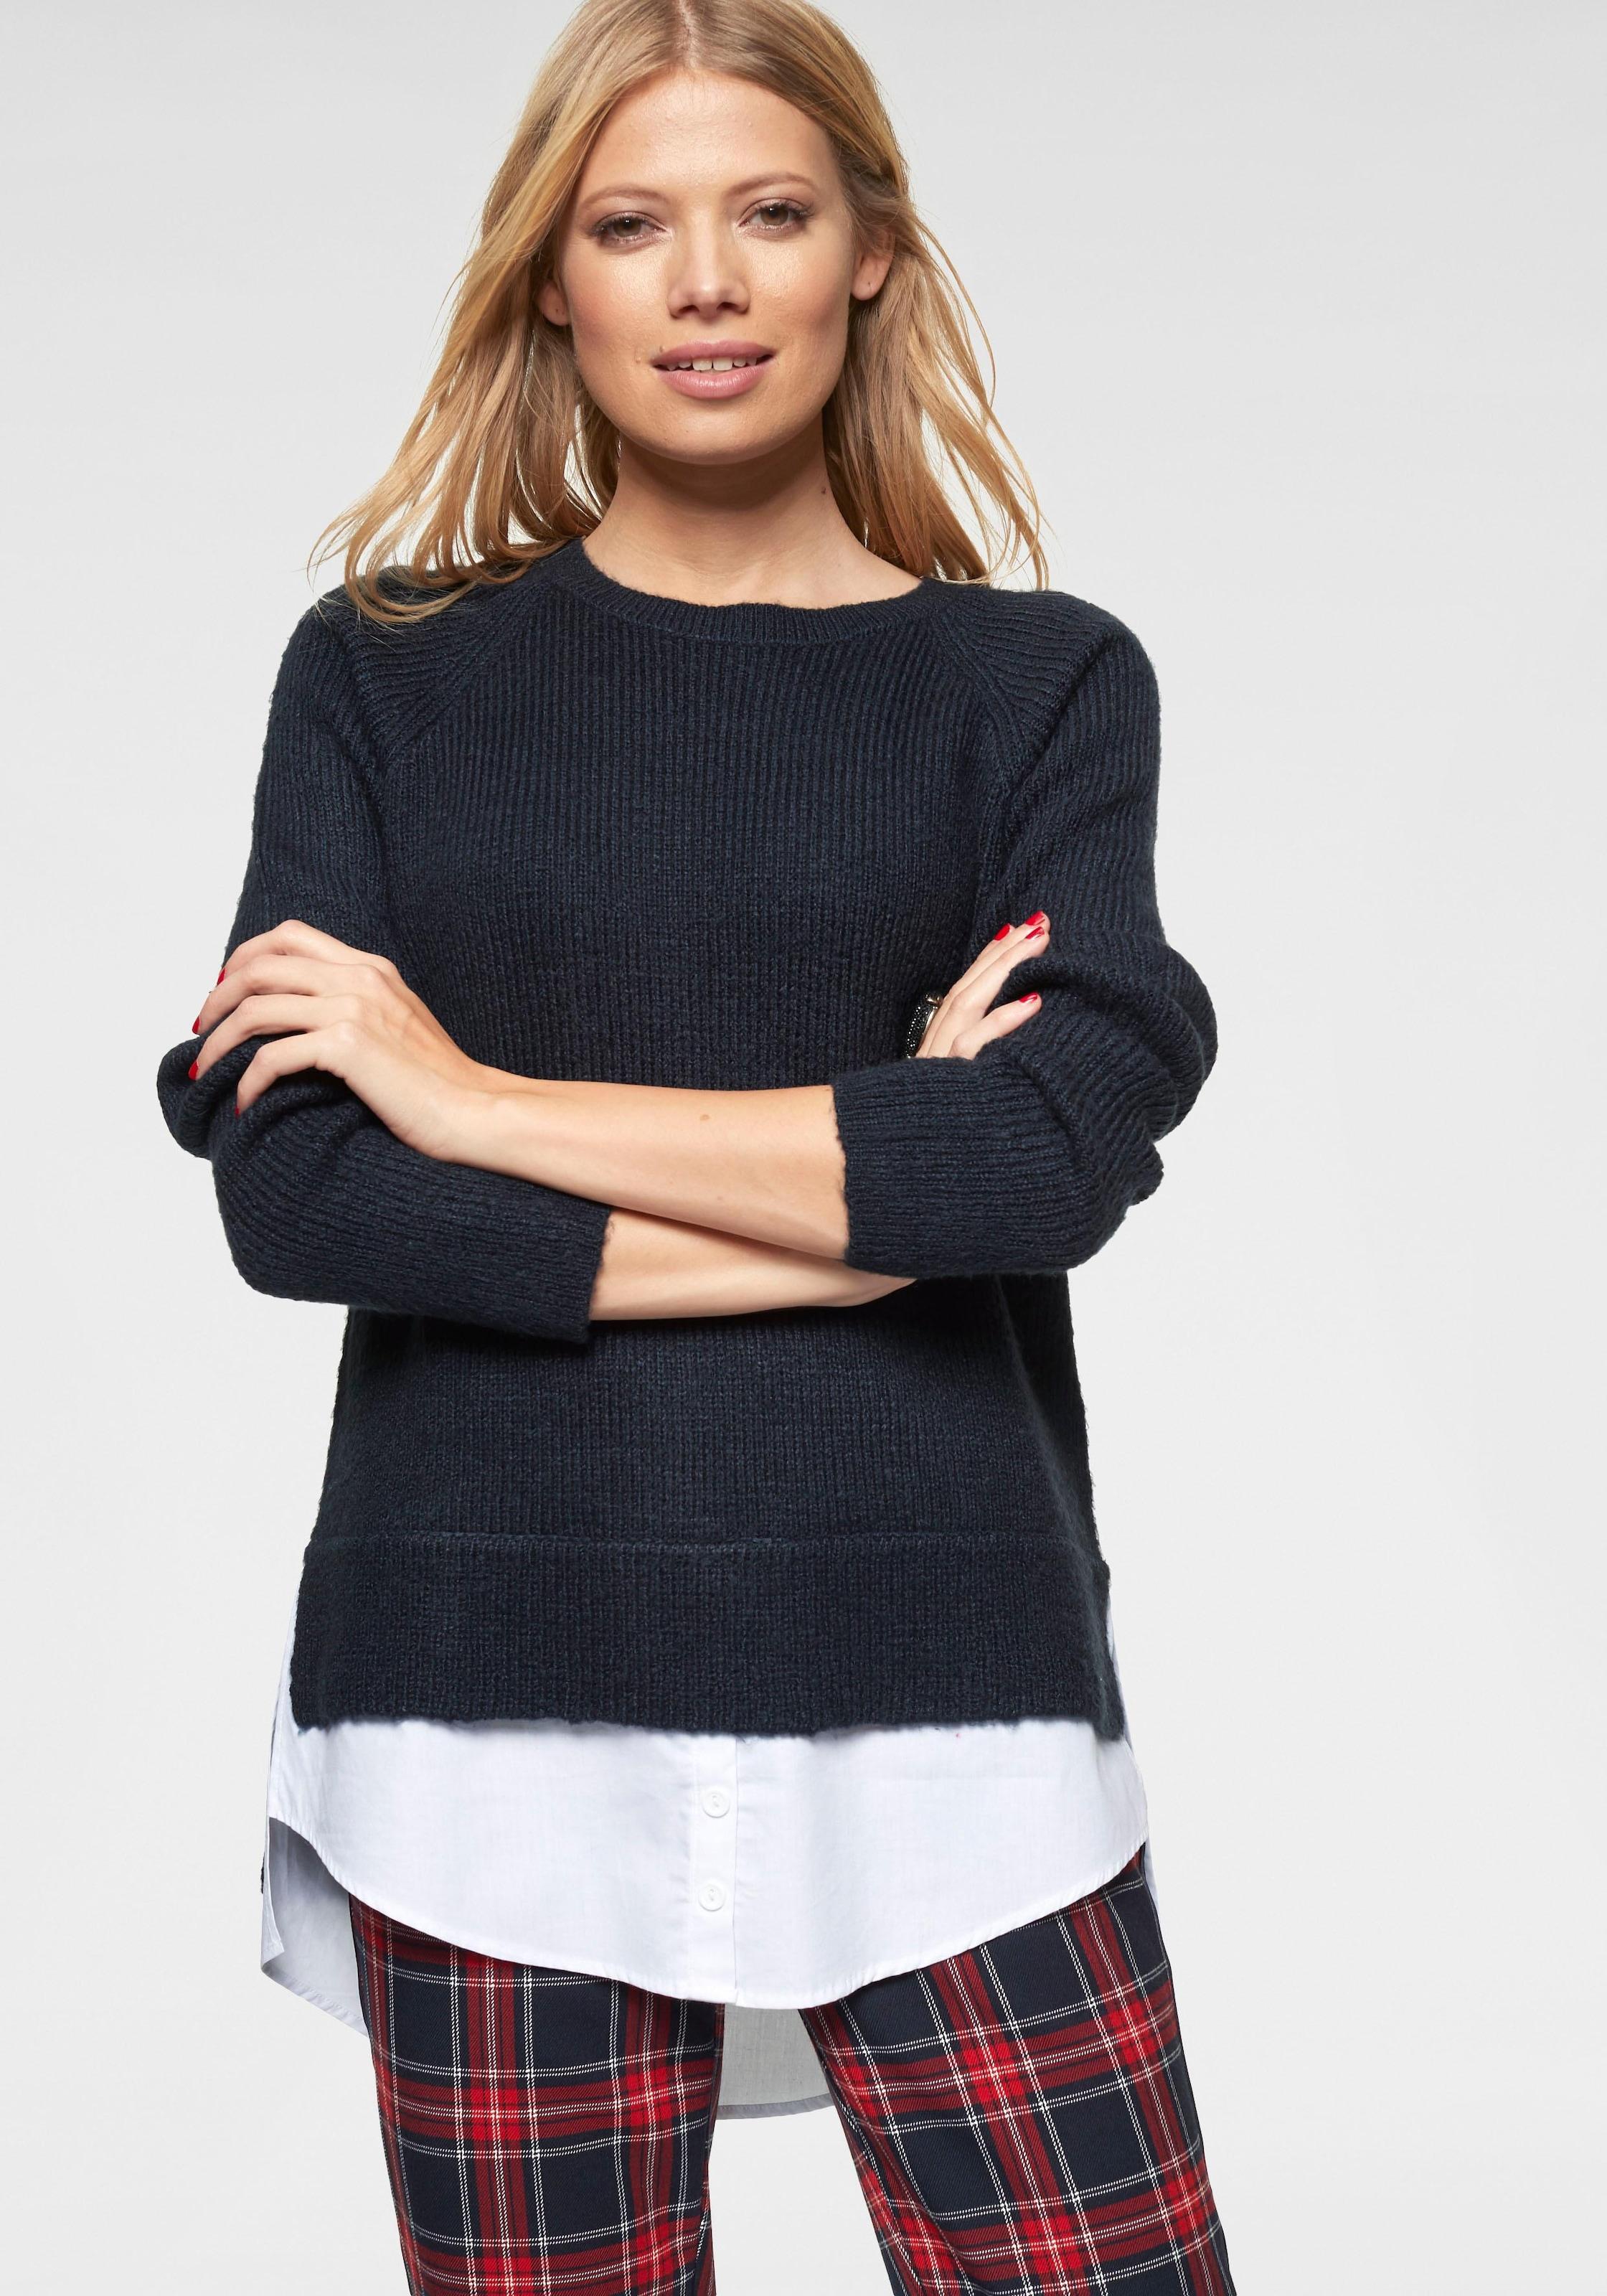 Image of Aniston CASUAL 2-in-1-Pullover, mit Blusenansatz am Saum